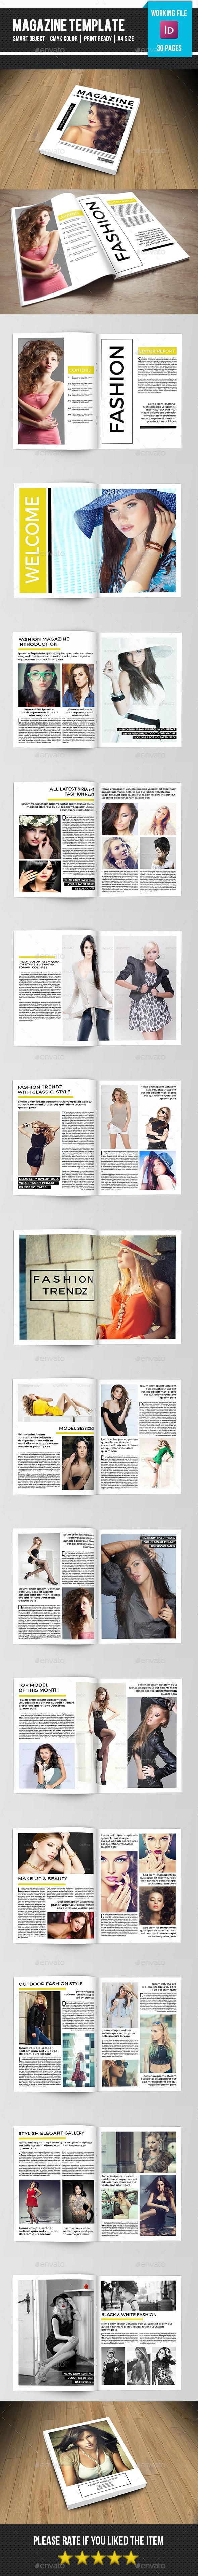 Minimal Fashion Magazine-V10 - Magazines Print Templates